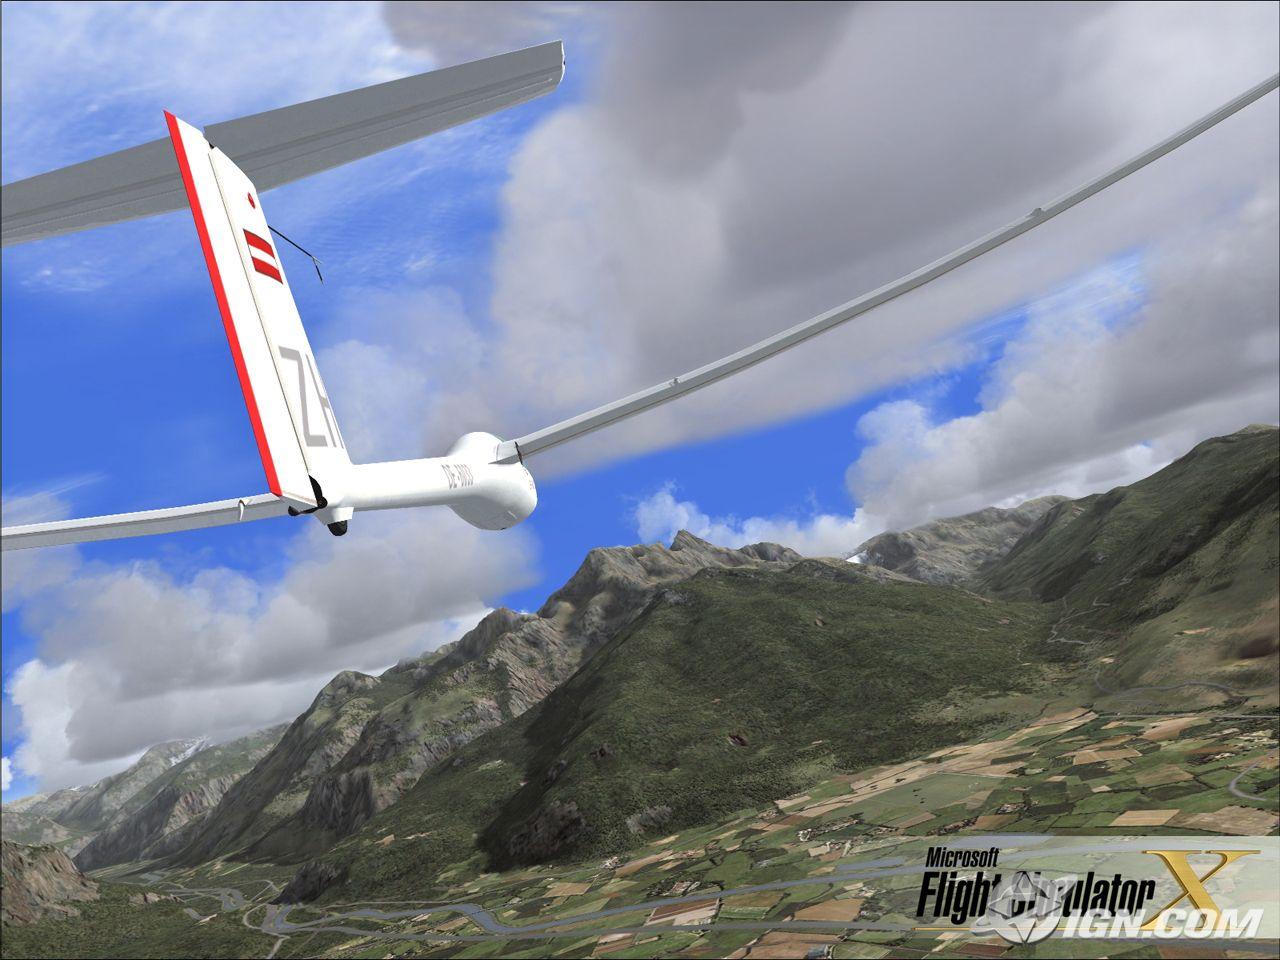 Flight Simulator X Screenshots Pictures Wallpapers   PC   IGN 1280x960